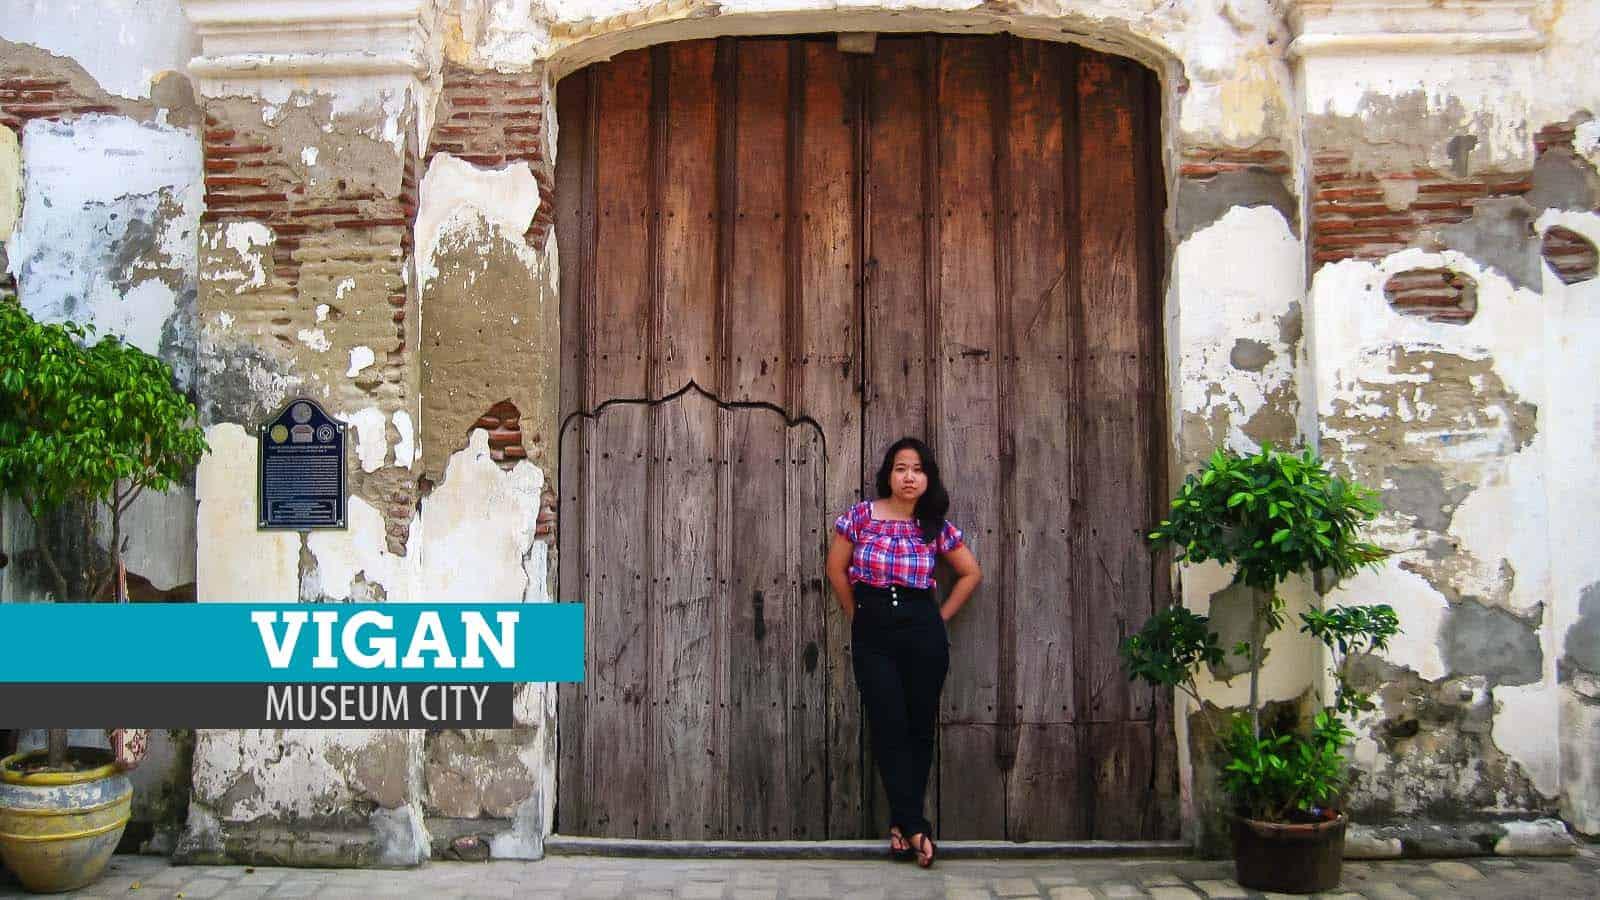 VIGAN: 菲律宾南伊罗戈斯的博物馆城市 | 穷游者的行程博客